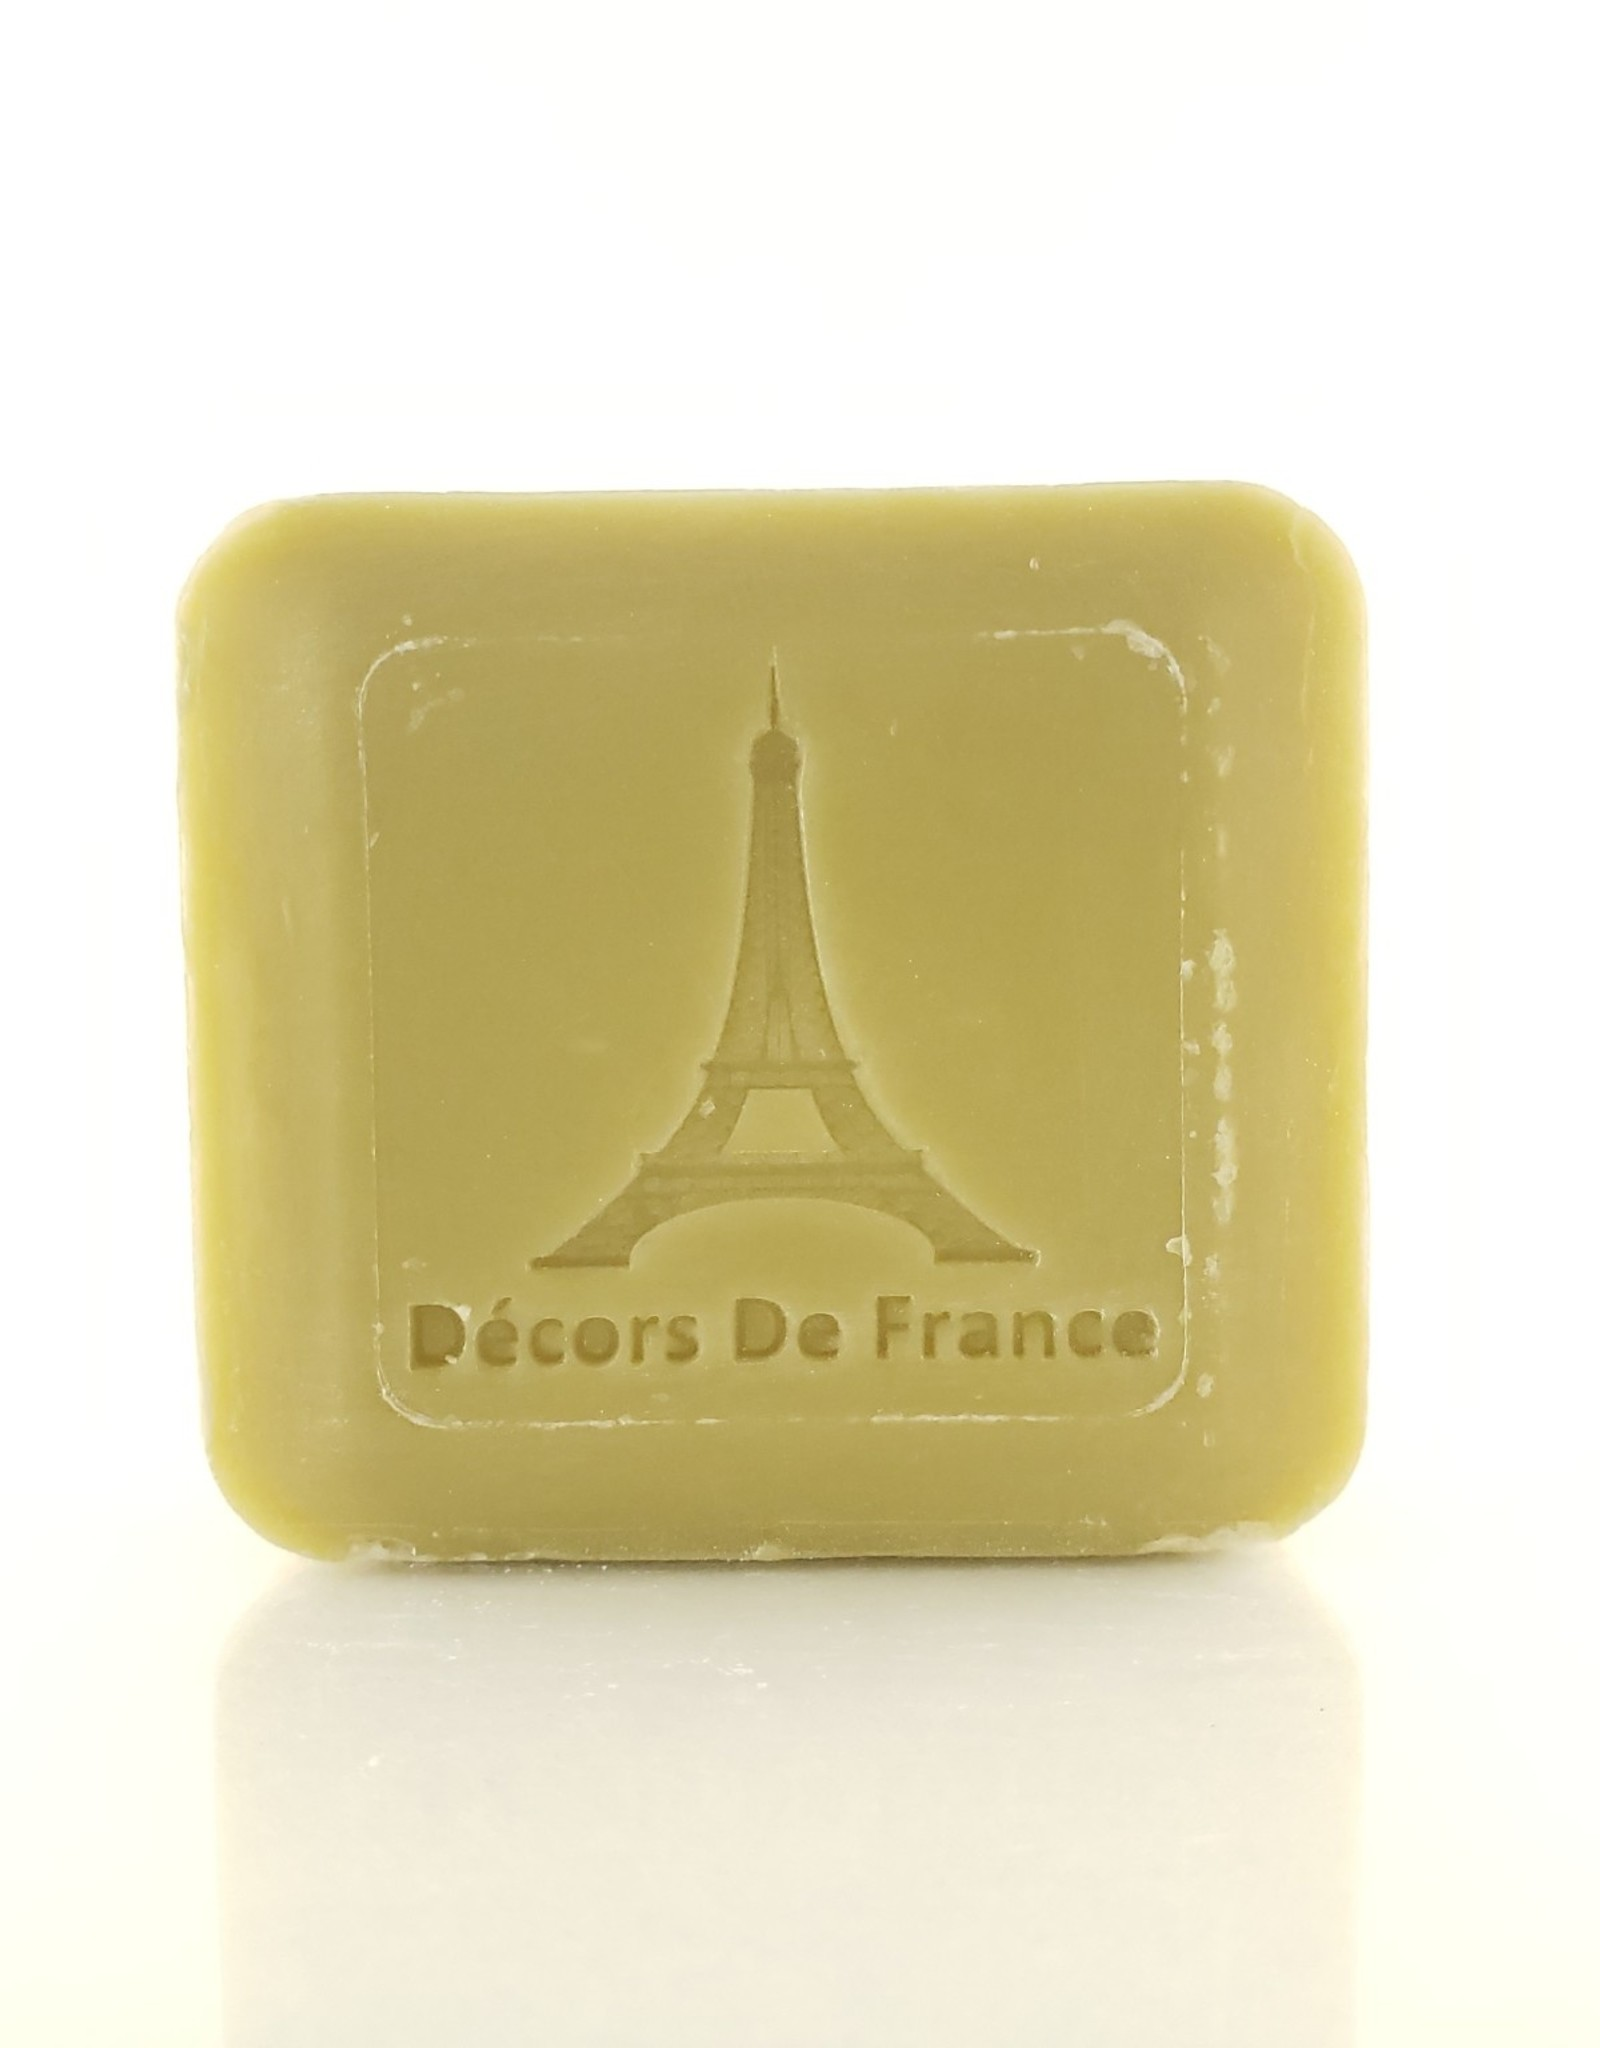 Verbena 100g Square Soap